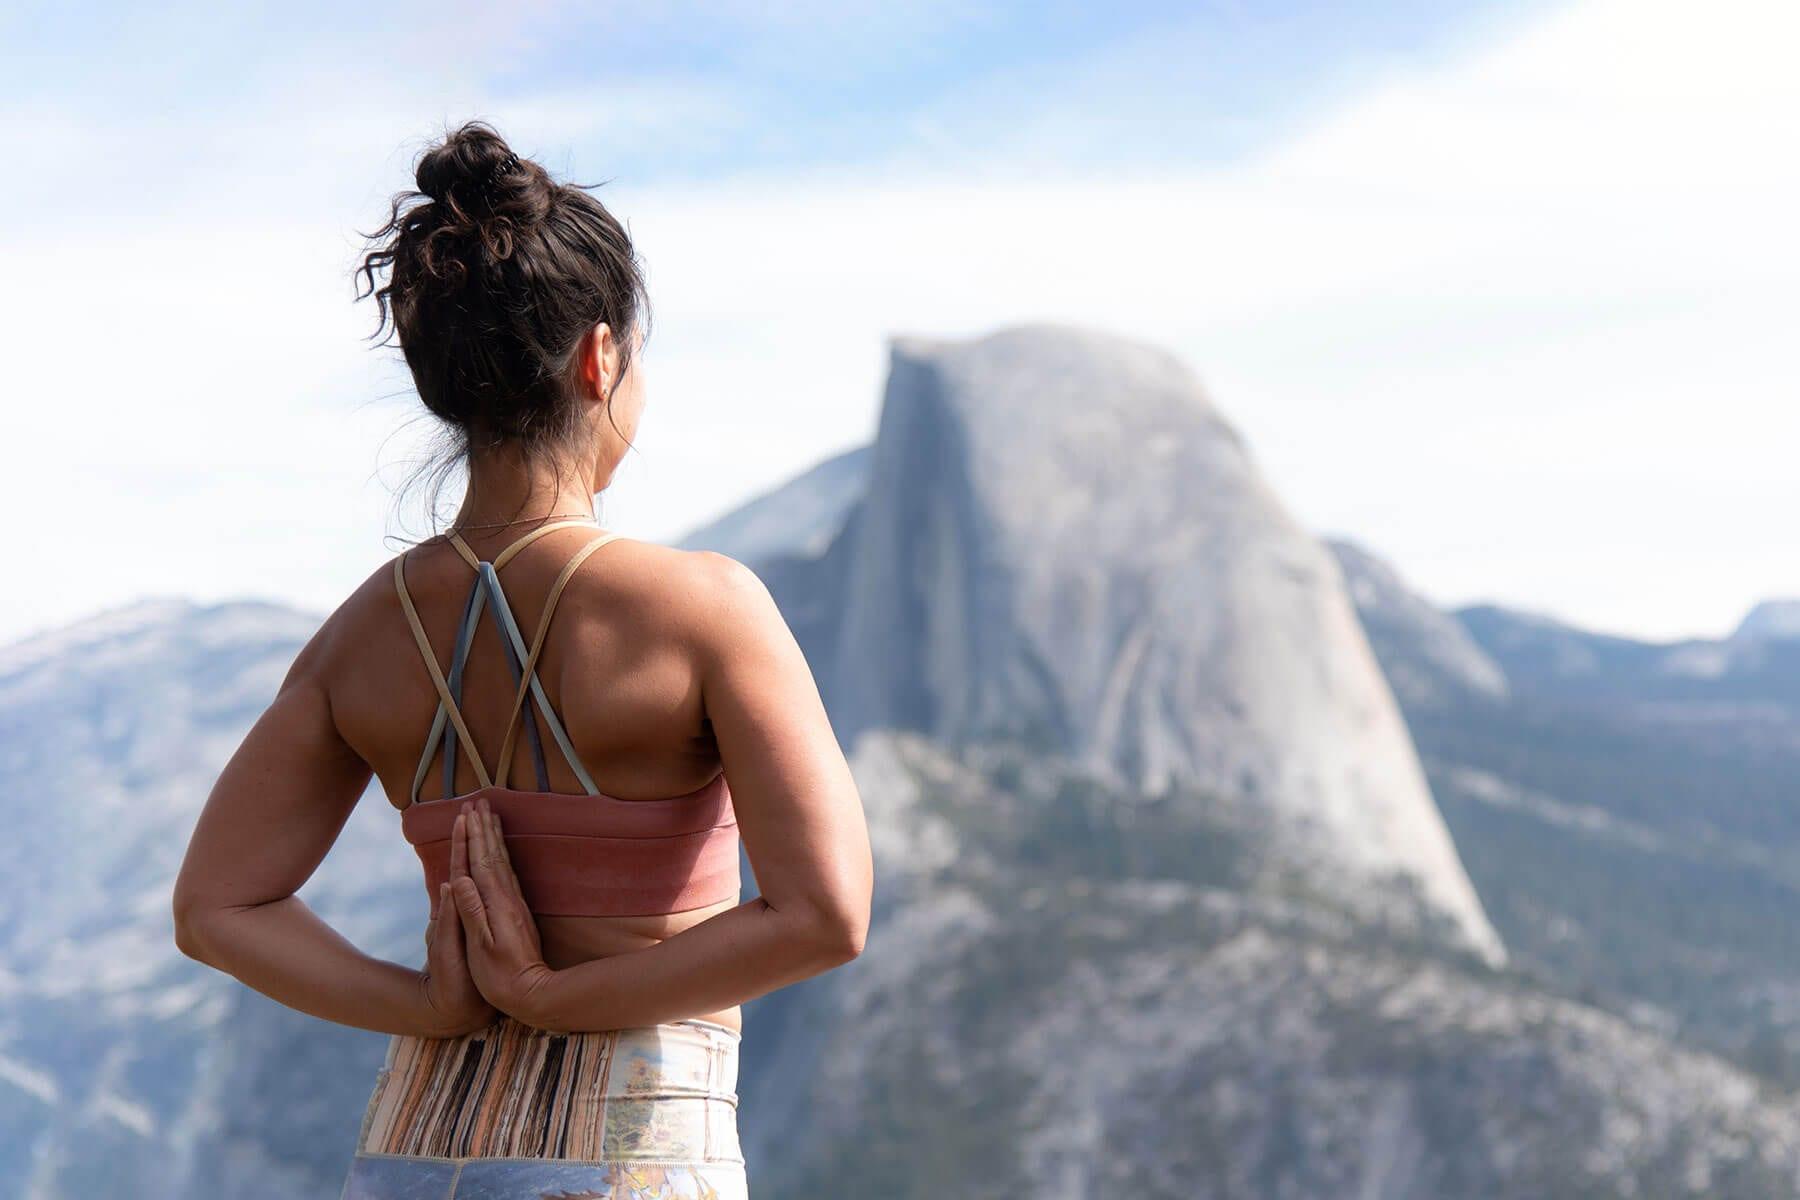 Jeny Dawson Reverse Prayer Hands Yosemite